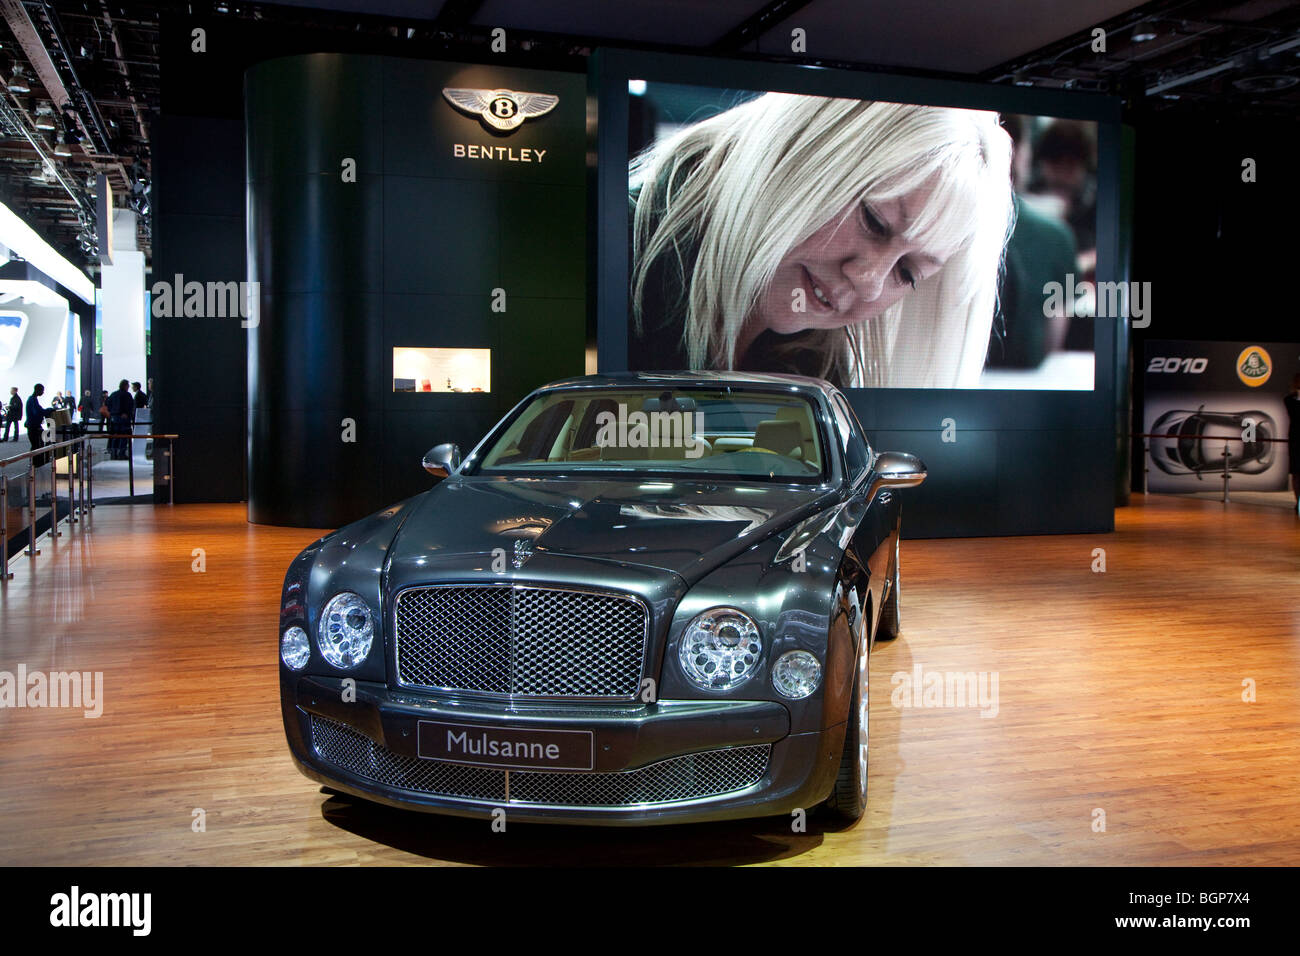 Bentley Mulsanne Stockbild